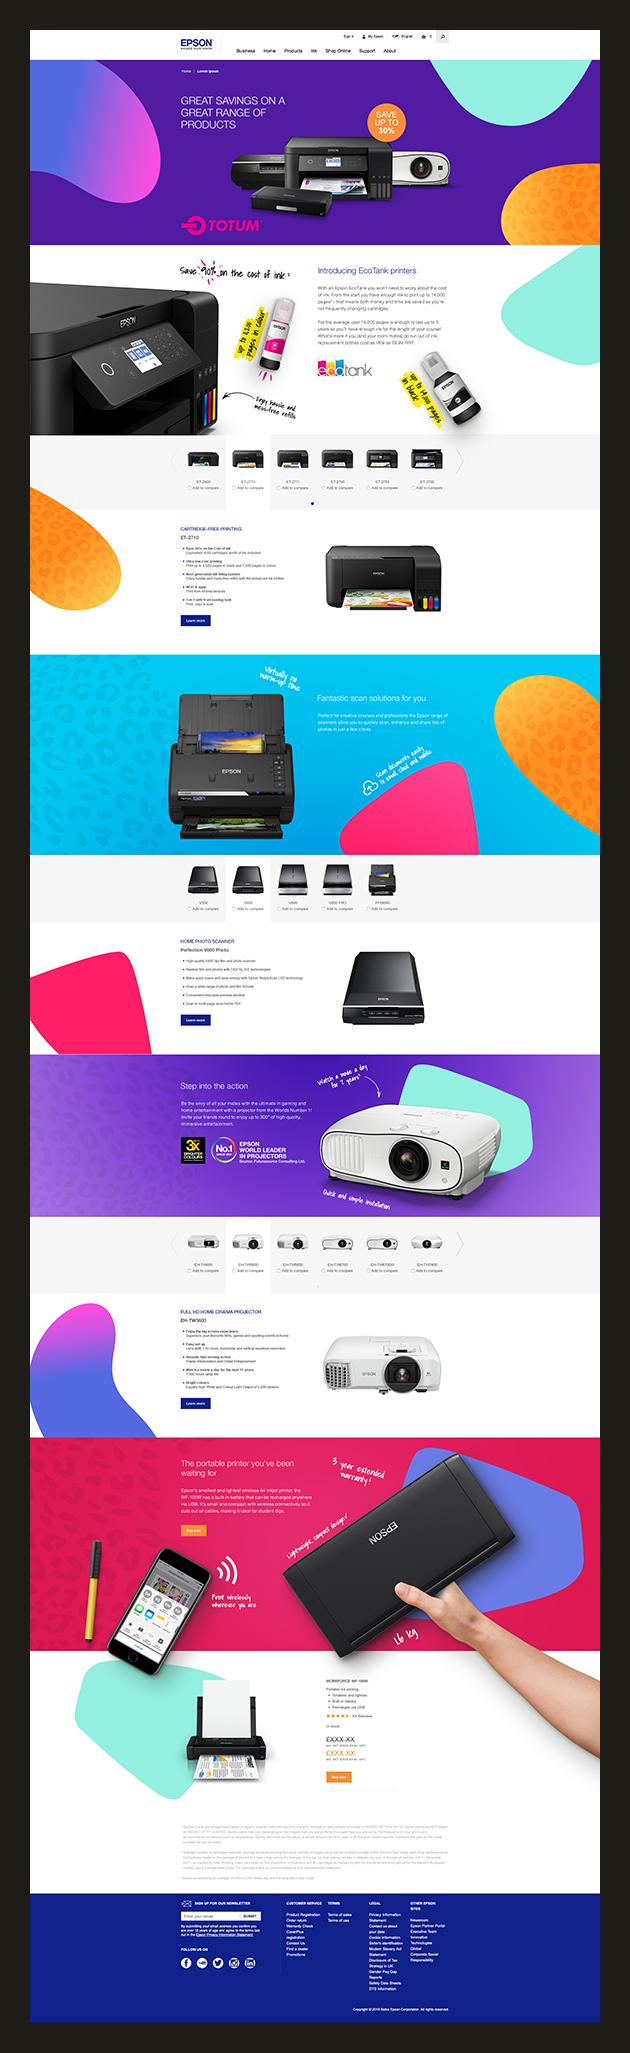 Creatve landing page website design